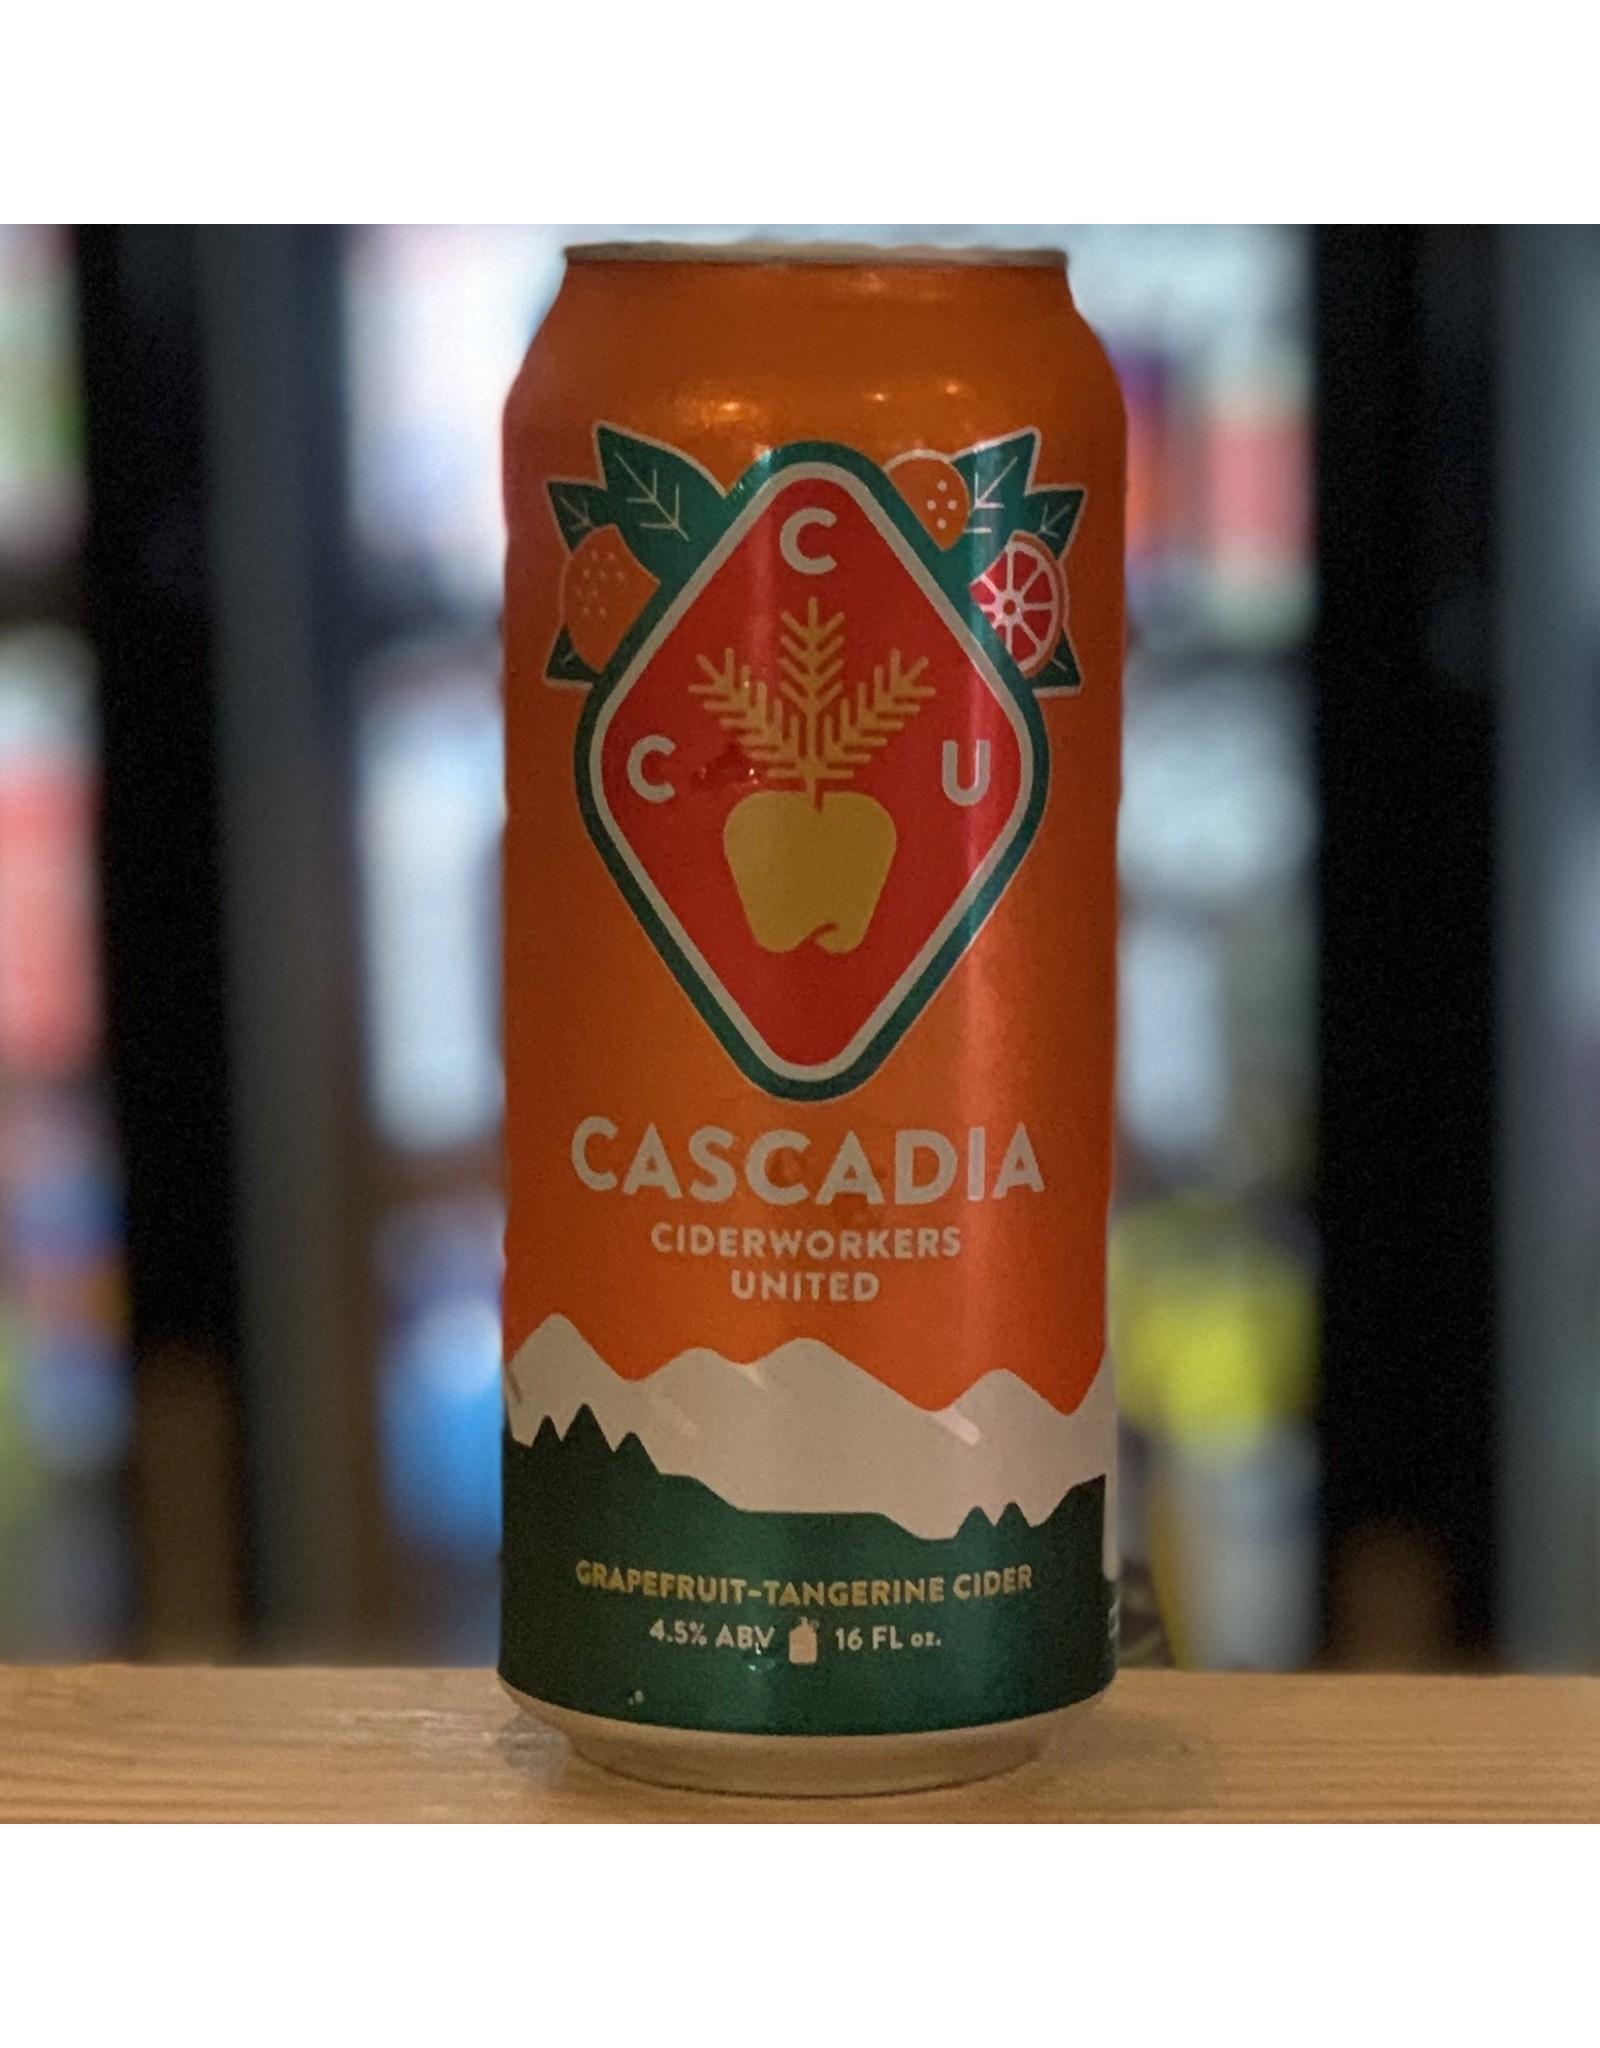 Cider Cascadia Cider w/Grapefruit and Tangerine - Portland, Oregon